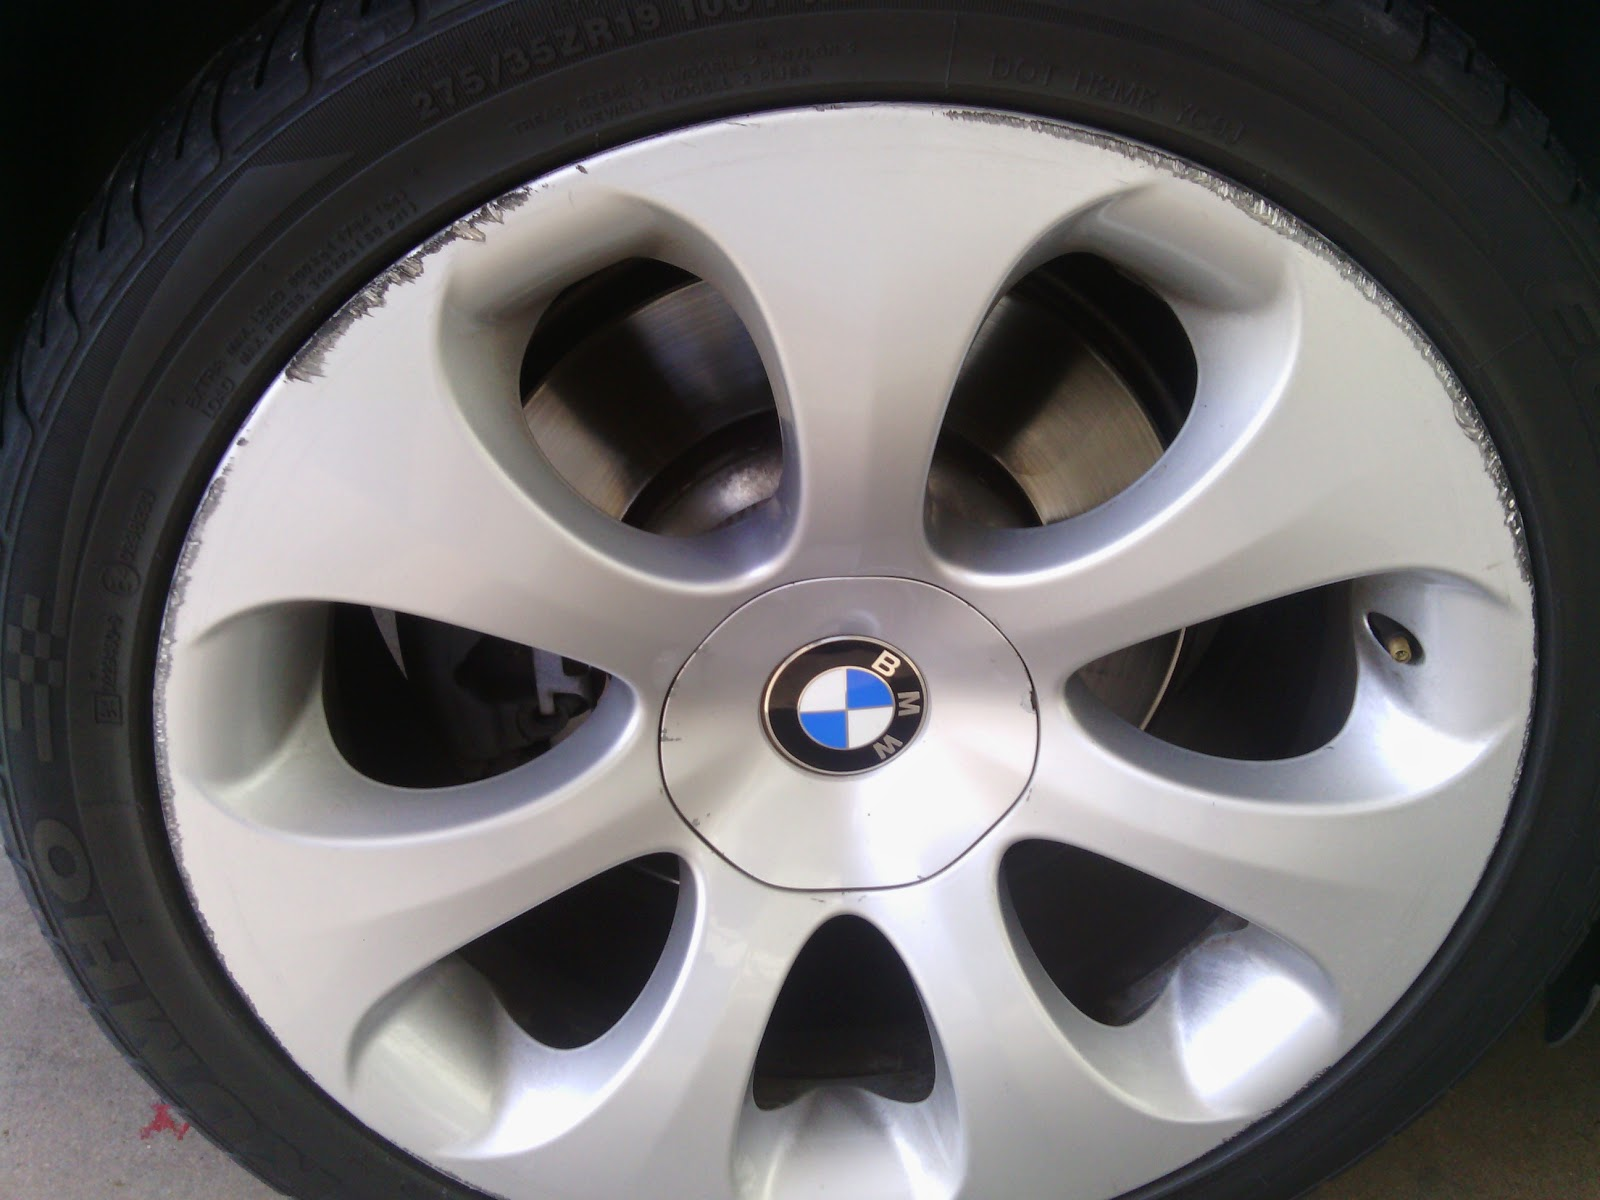 a bad tire can cause rim or wheel repair service